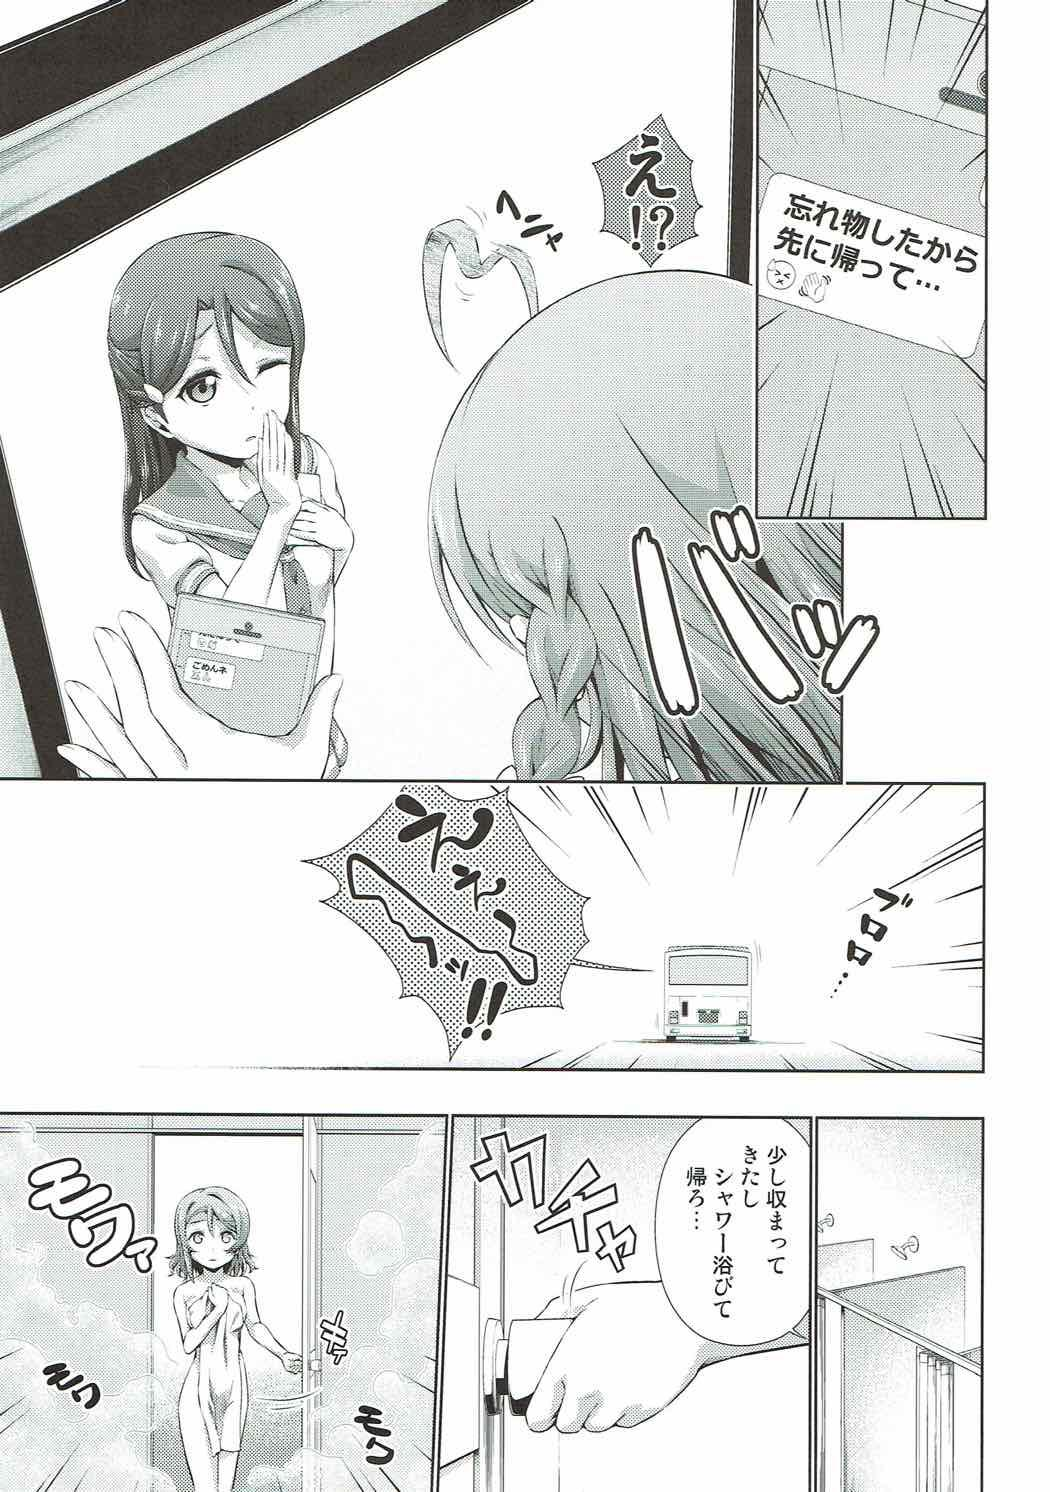 Chika-chan ni mo Naisho no Himitsu 15